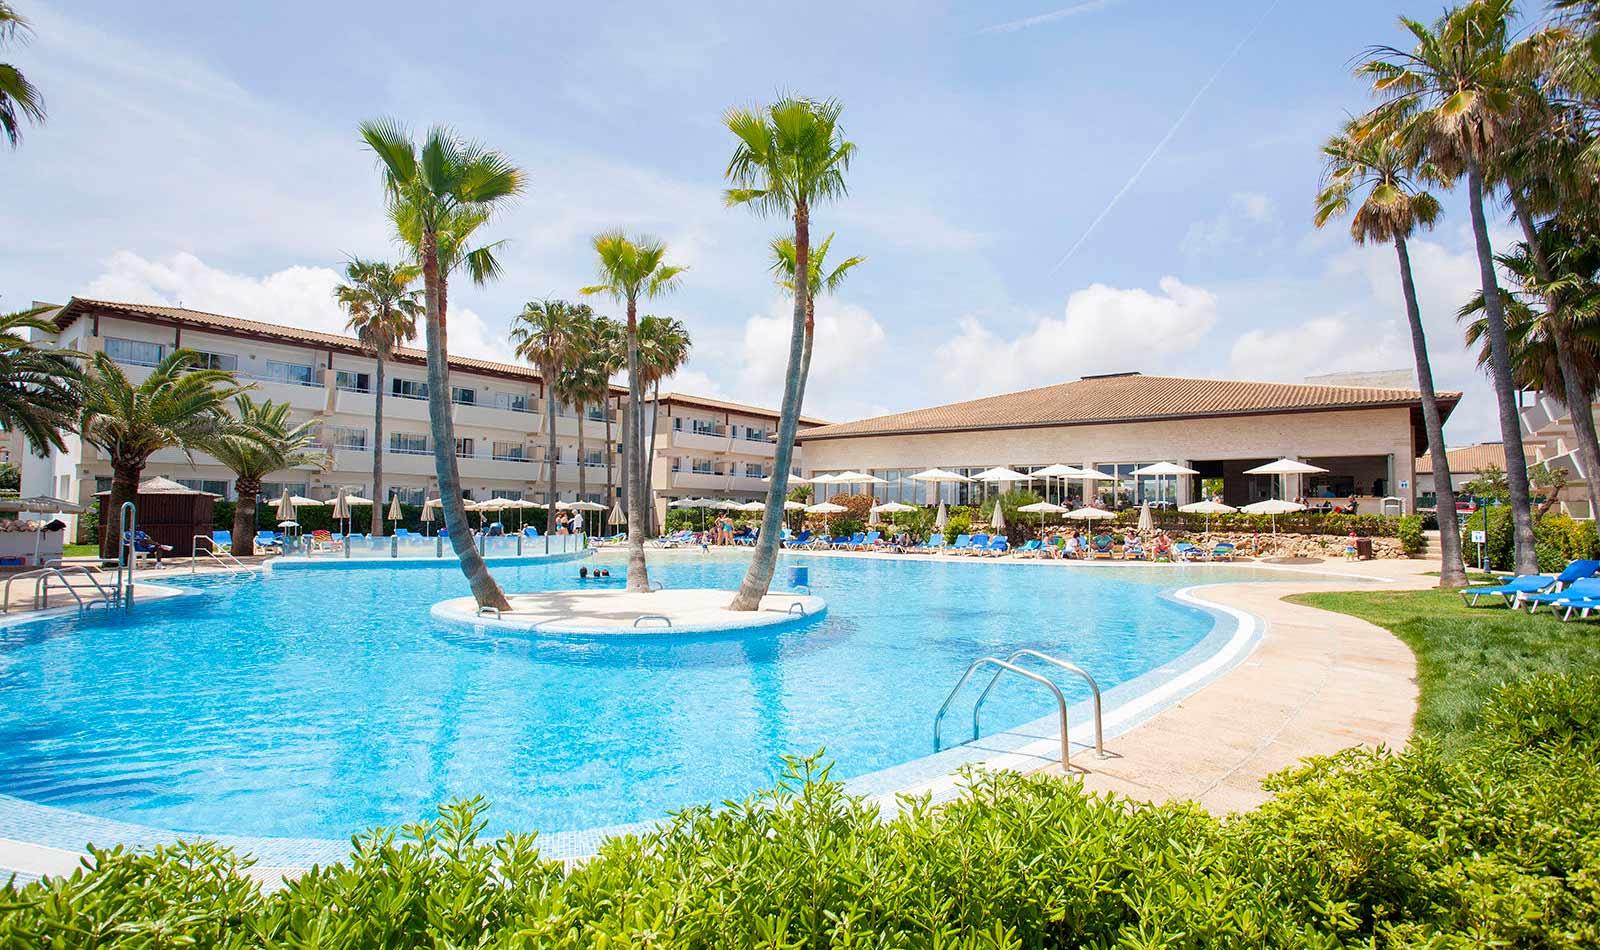 tui family life mallorca mar - Hotels Mit Glutenfreier Kuche Auf Mallorca